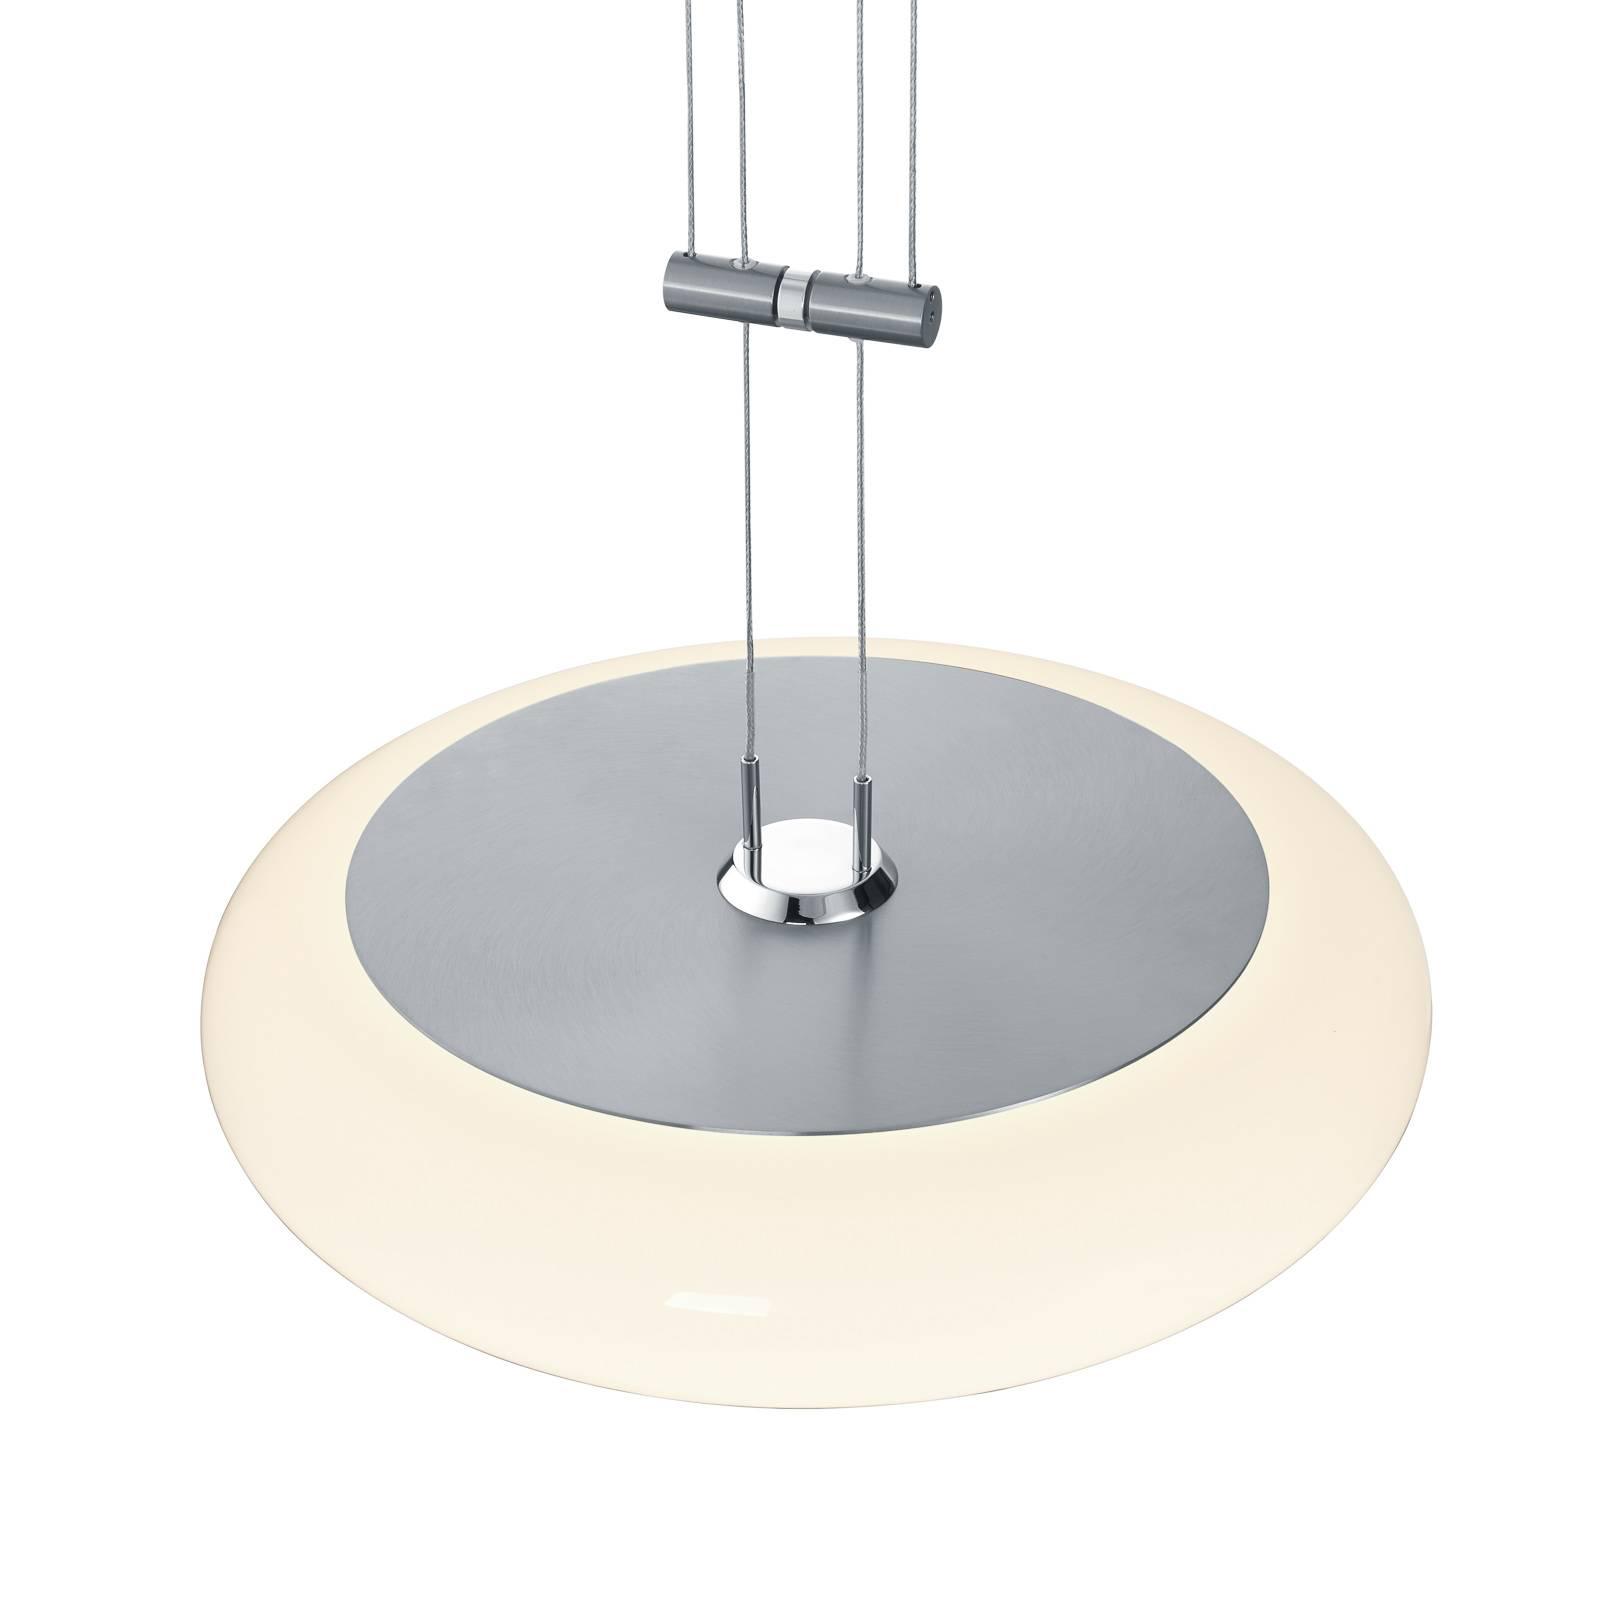 BANKAMP Centa riippuvalaisin 1-lamp 34 cm nikkeli